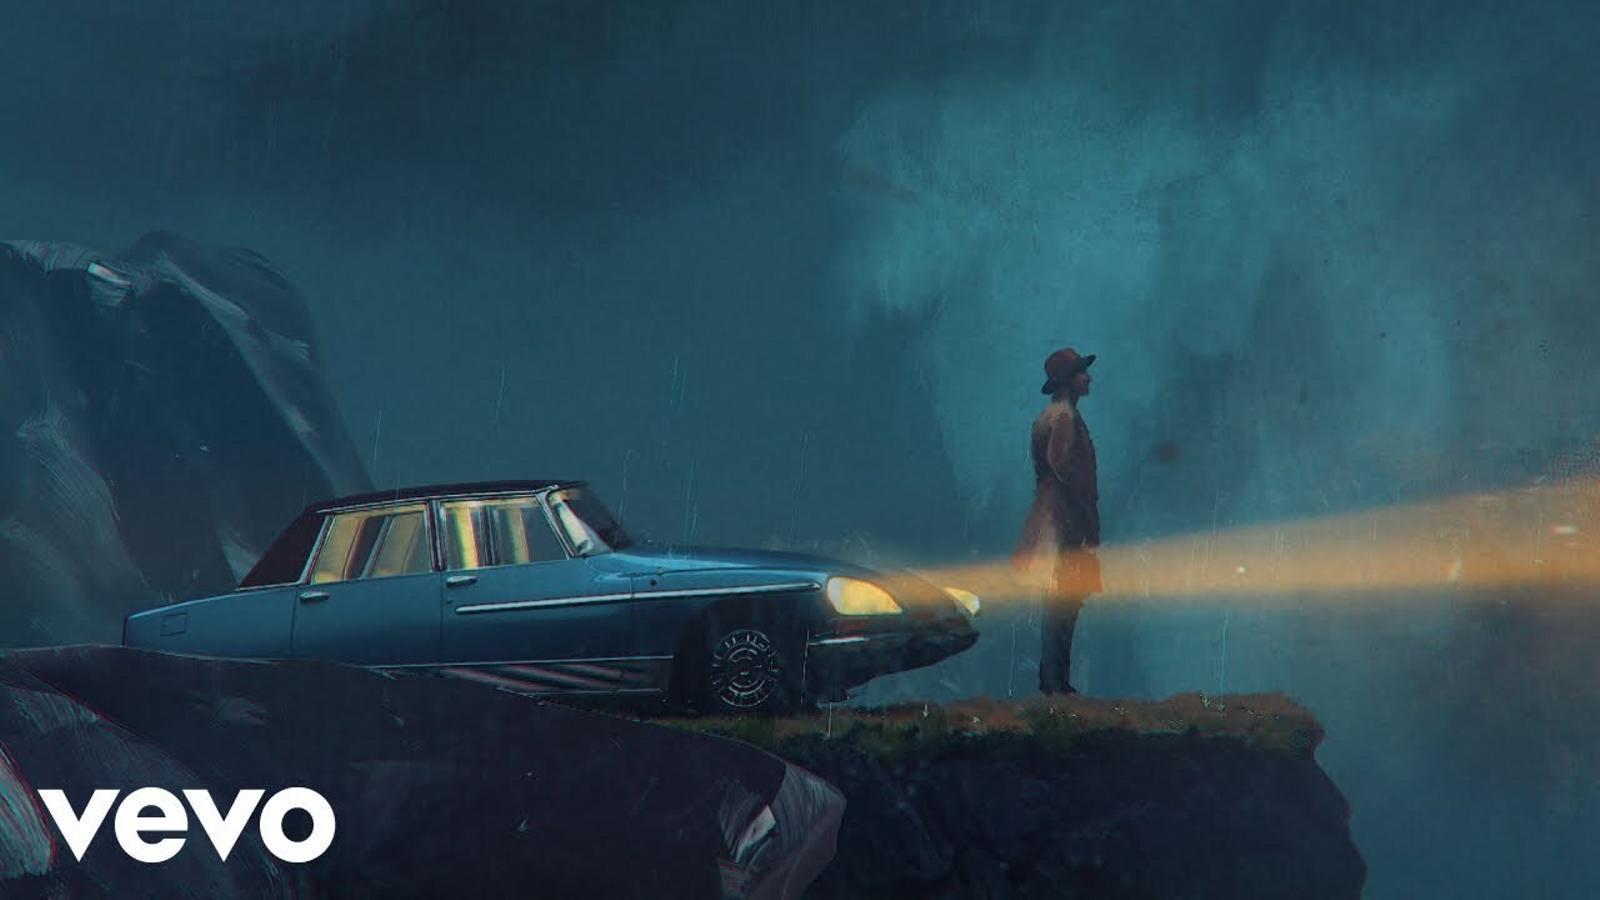 La Oreja de Van Gohg, 'Abrázame', videoclip